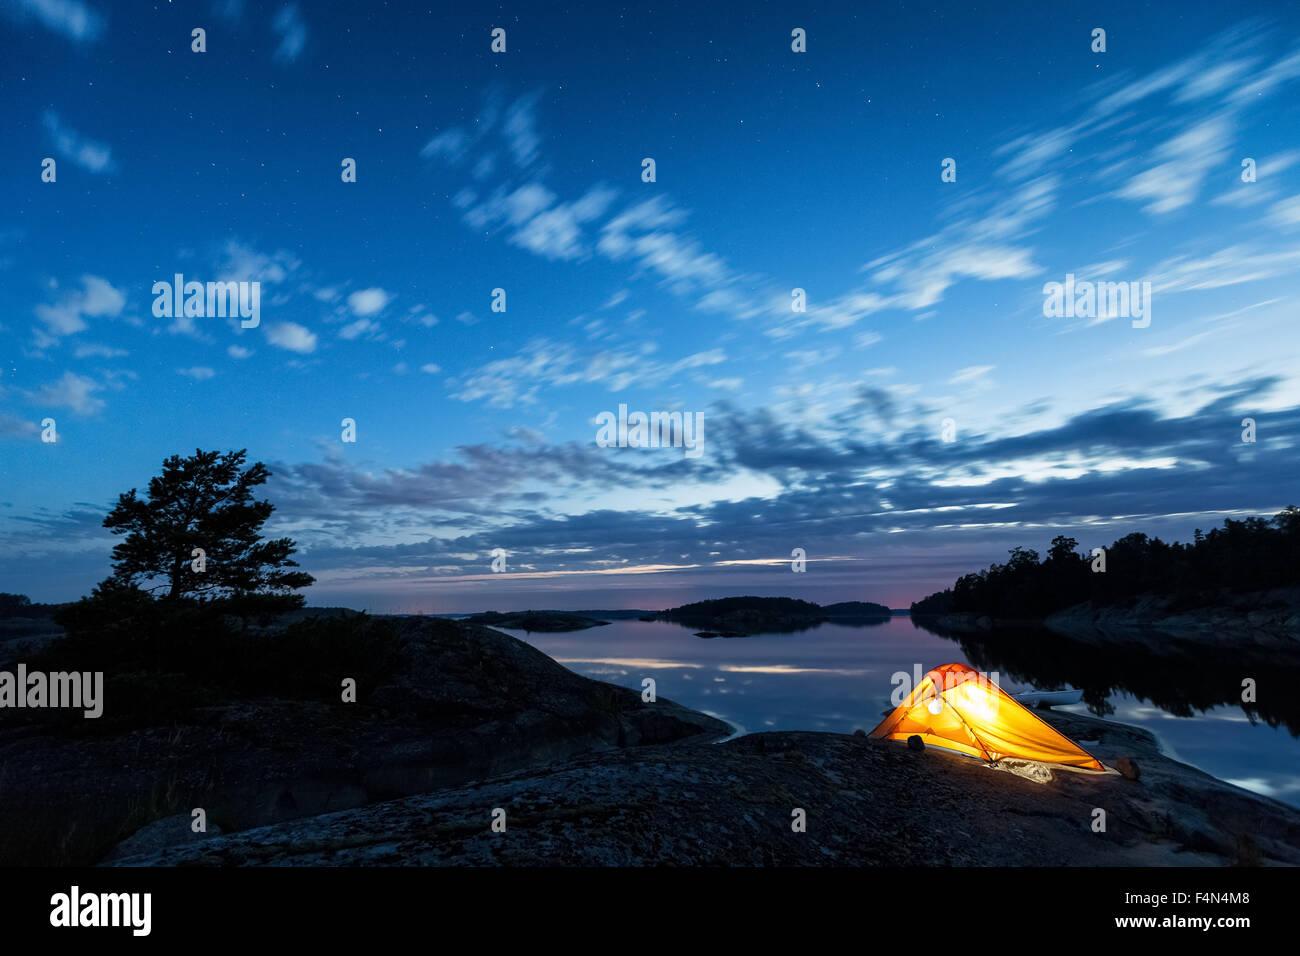 Camping à Tammisaari archipel, Tammisaari, Finlande, Europe, UNION EUROPÉENNE Photo Stock